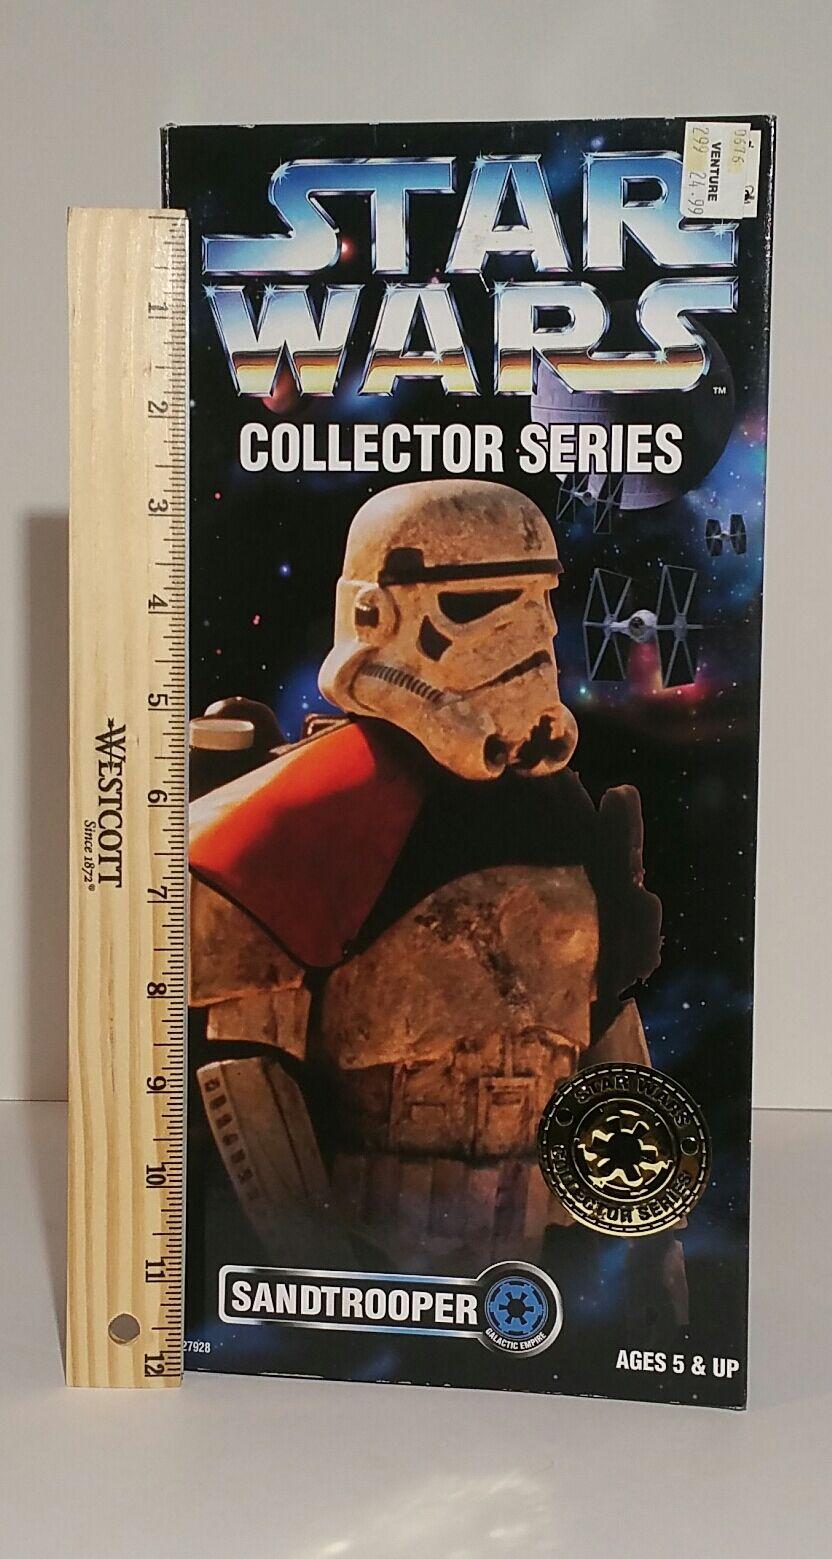 Star Wars Sandtrooper orange Shoulder Collector Series 12 in 1996 MIB